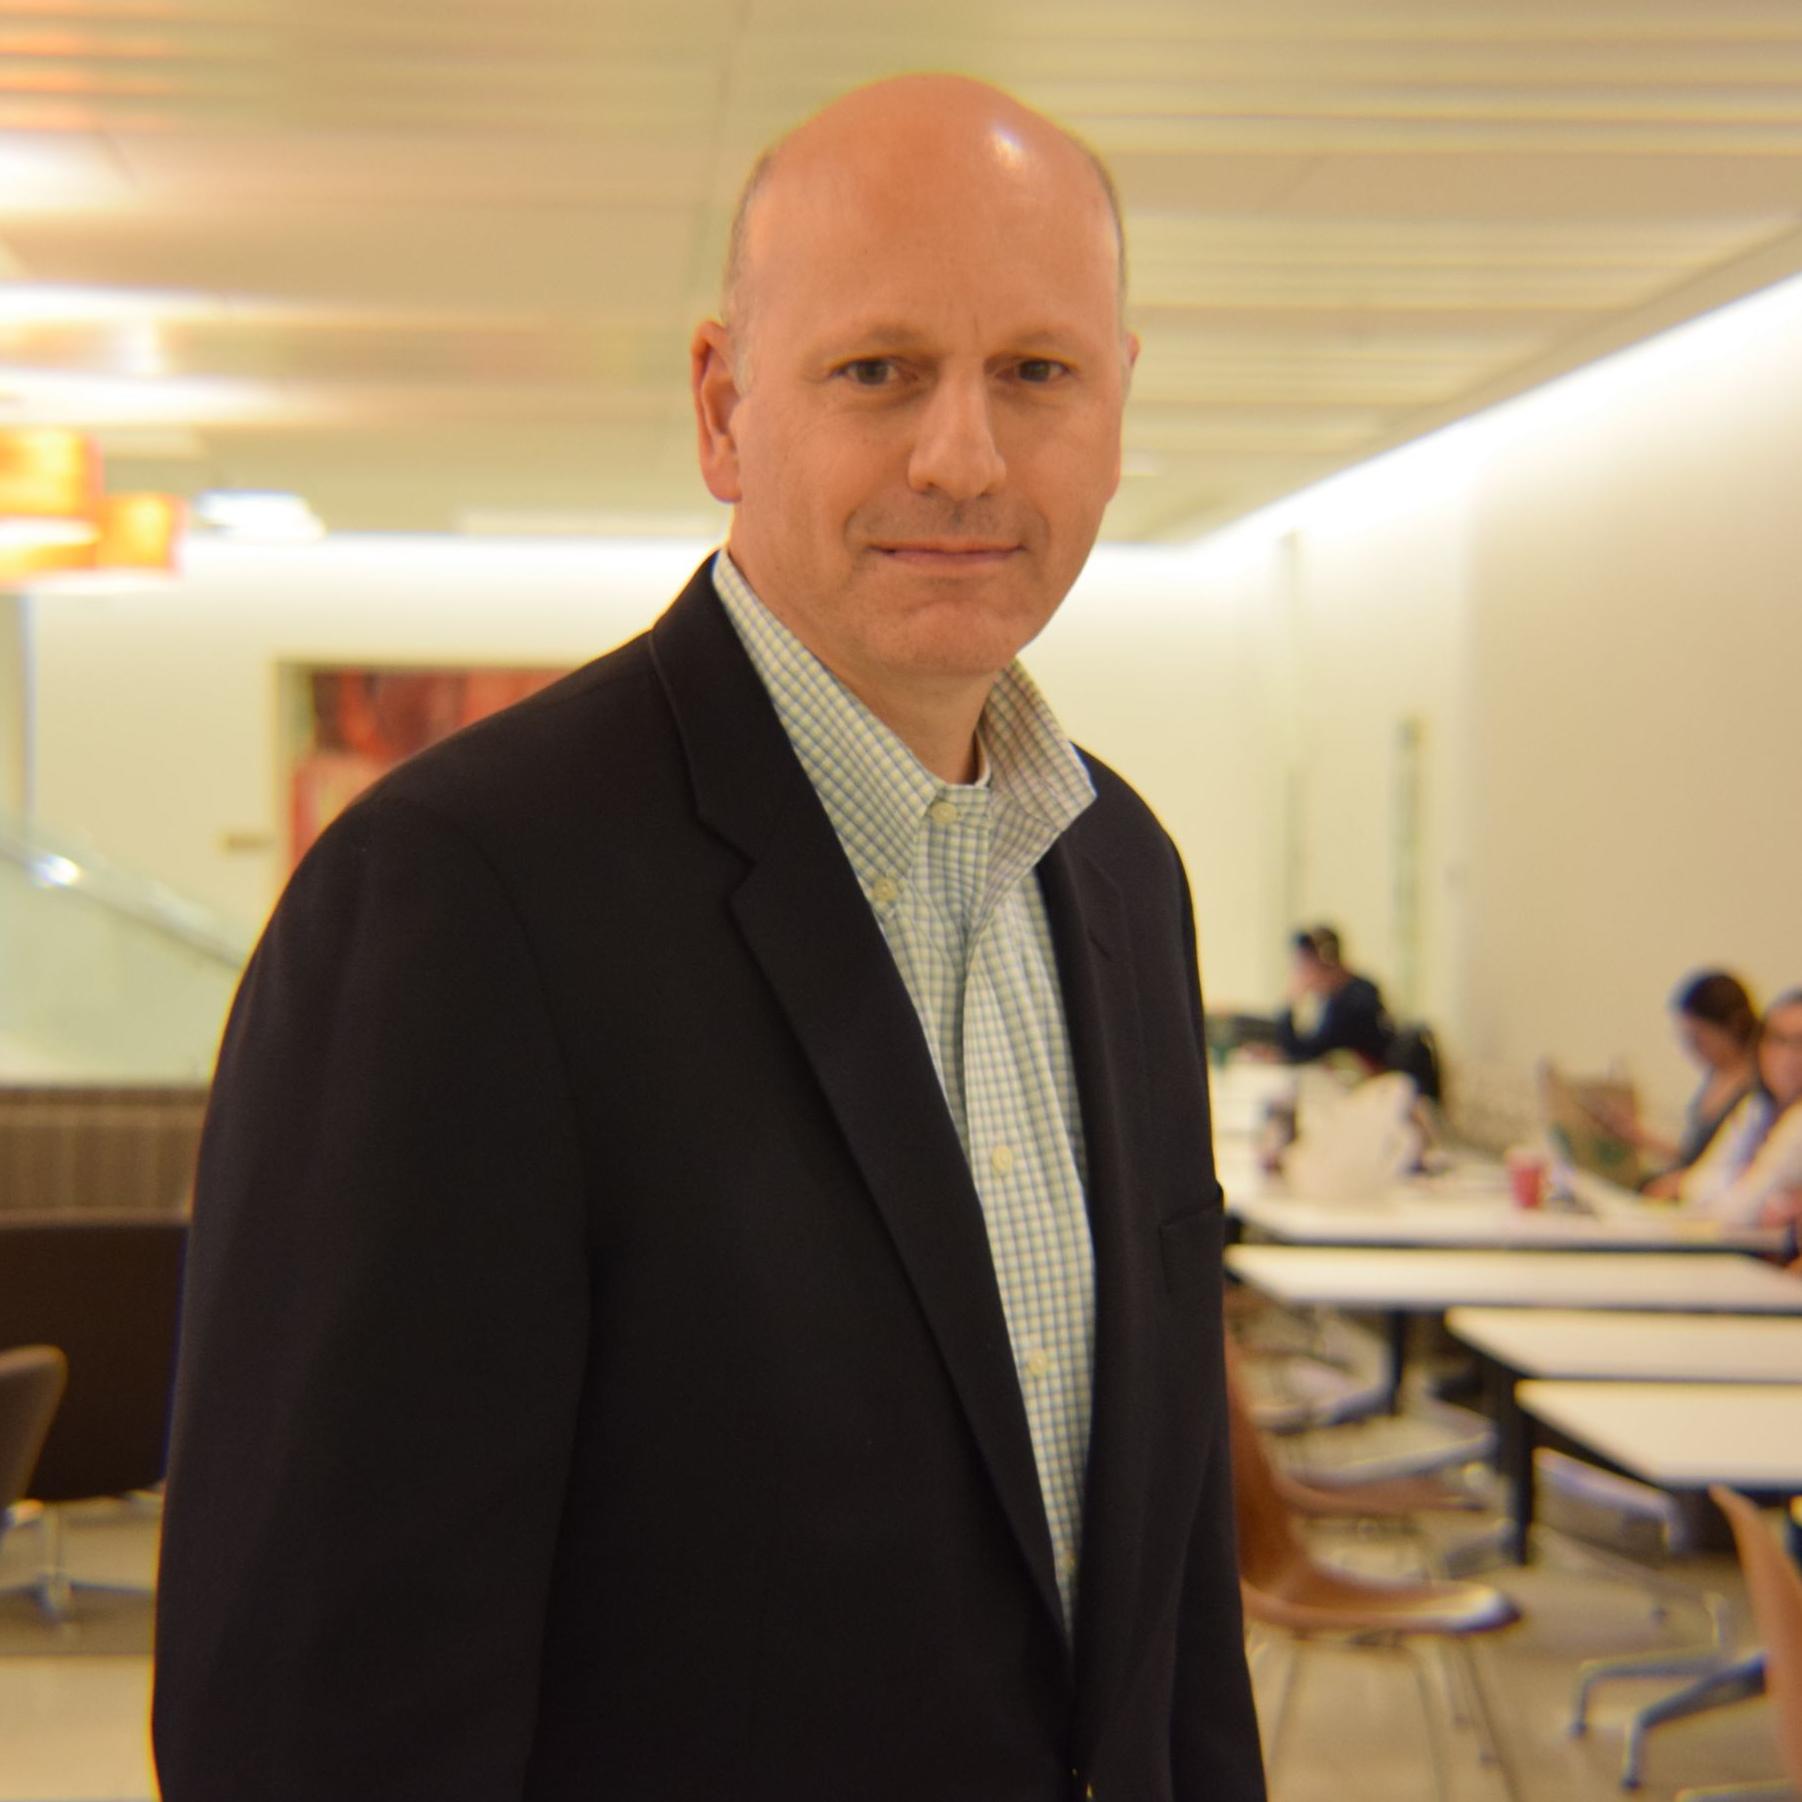 Eric L. Yaffe